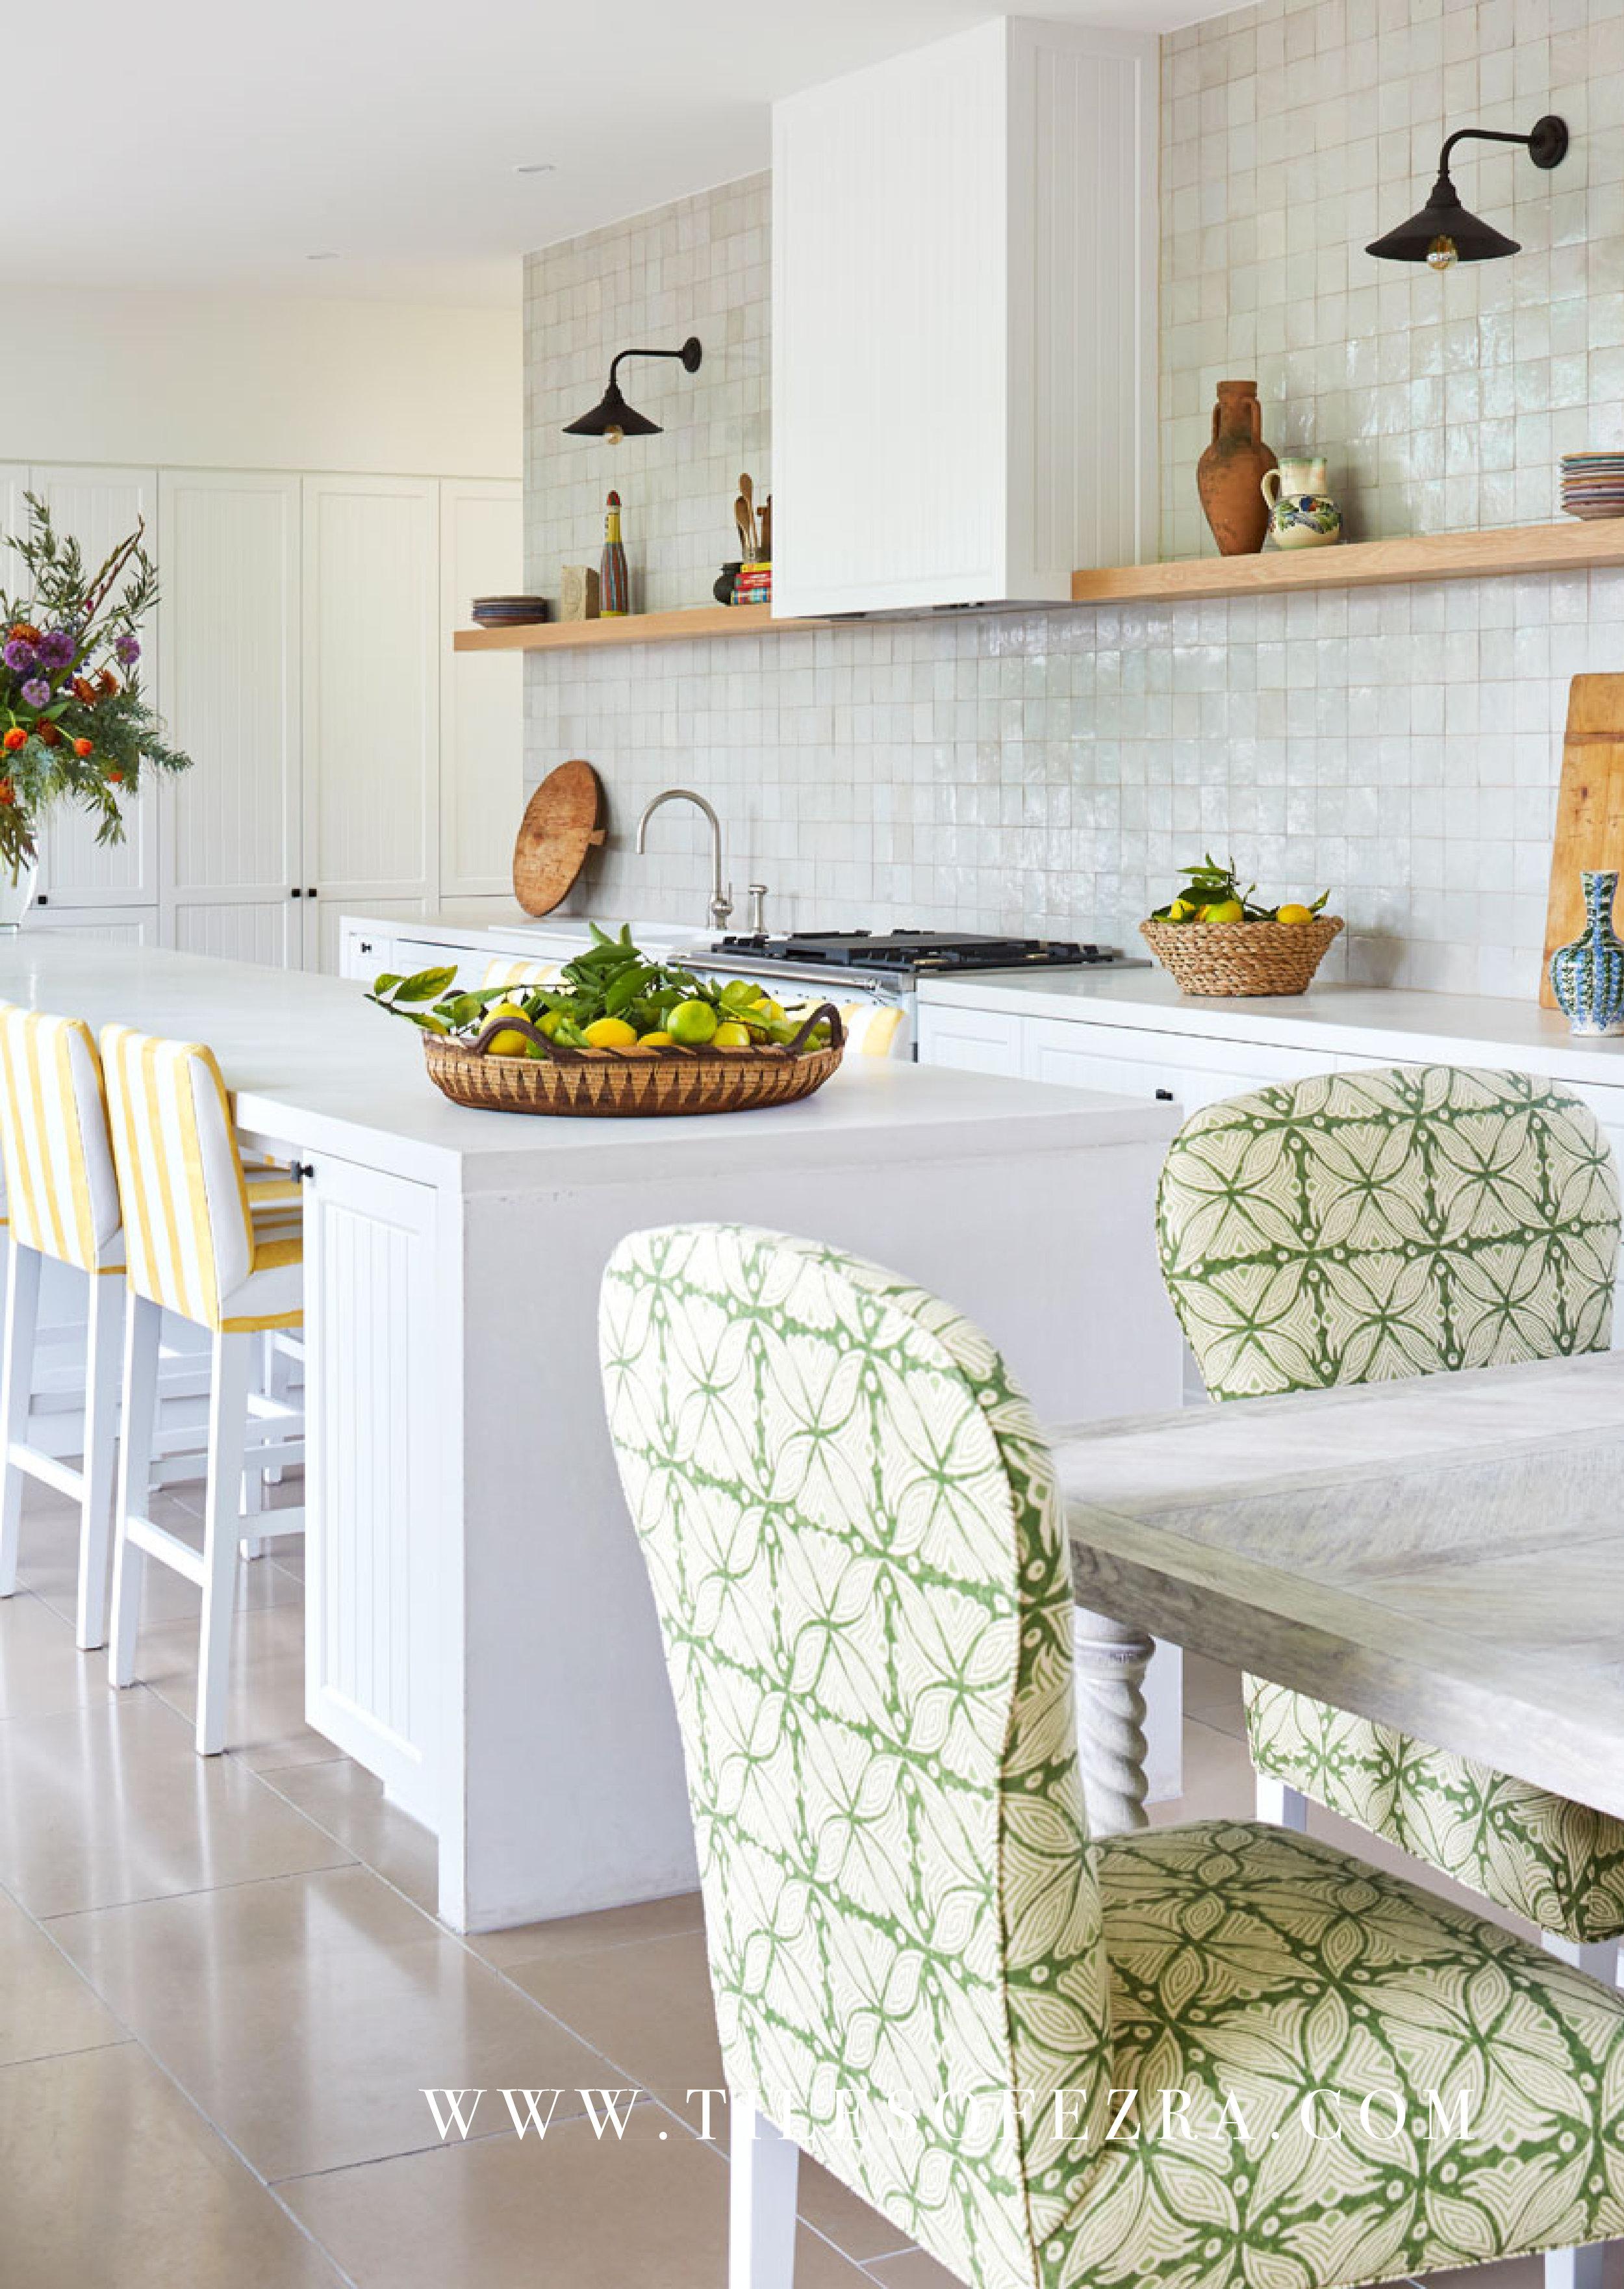 Tilesofezra  white ZEL001B Kitchen. Melbourne-City-House Detail.jpg